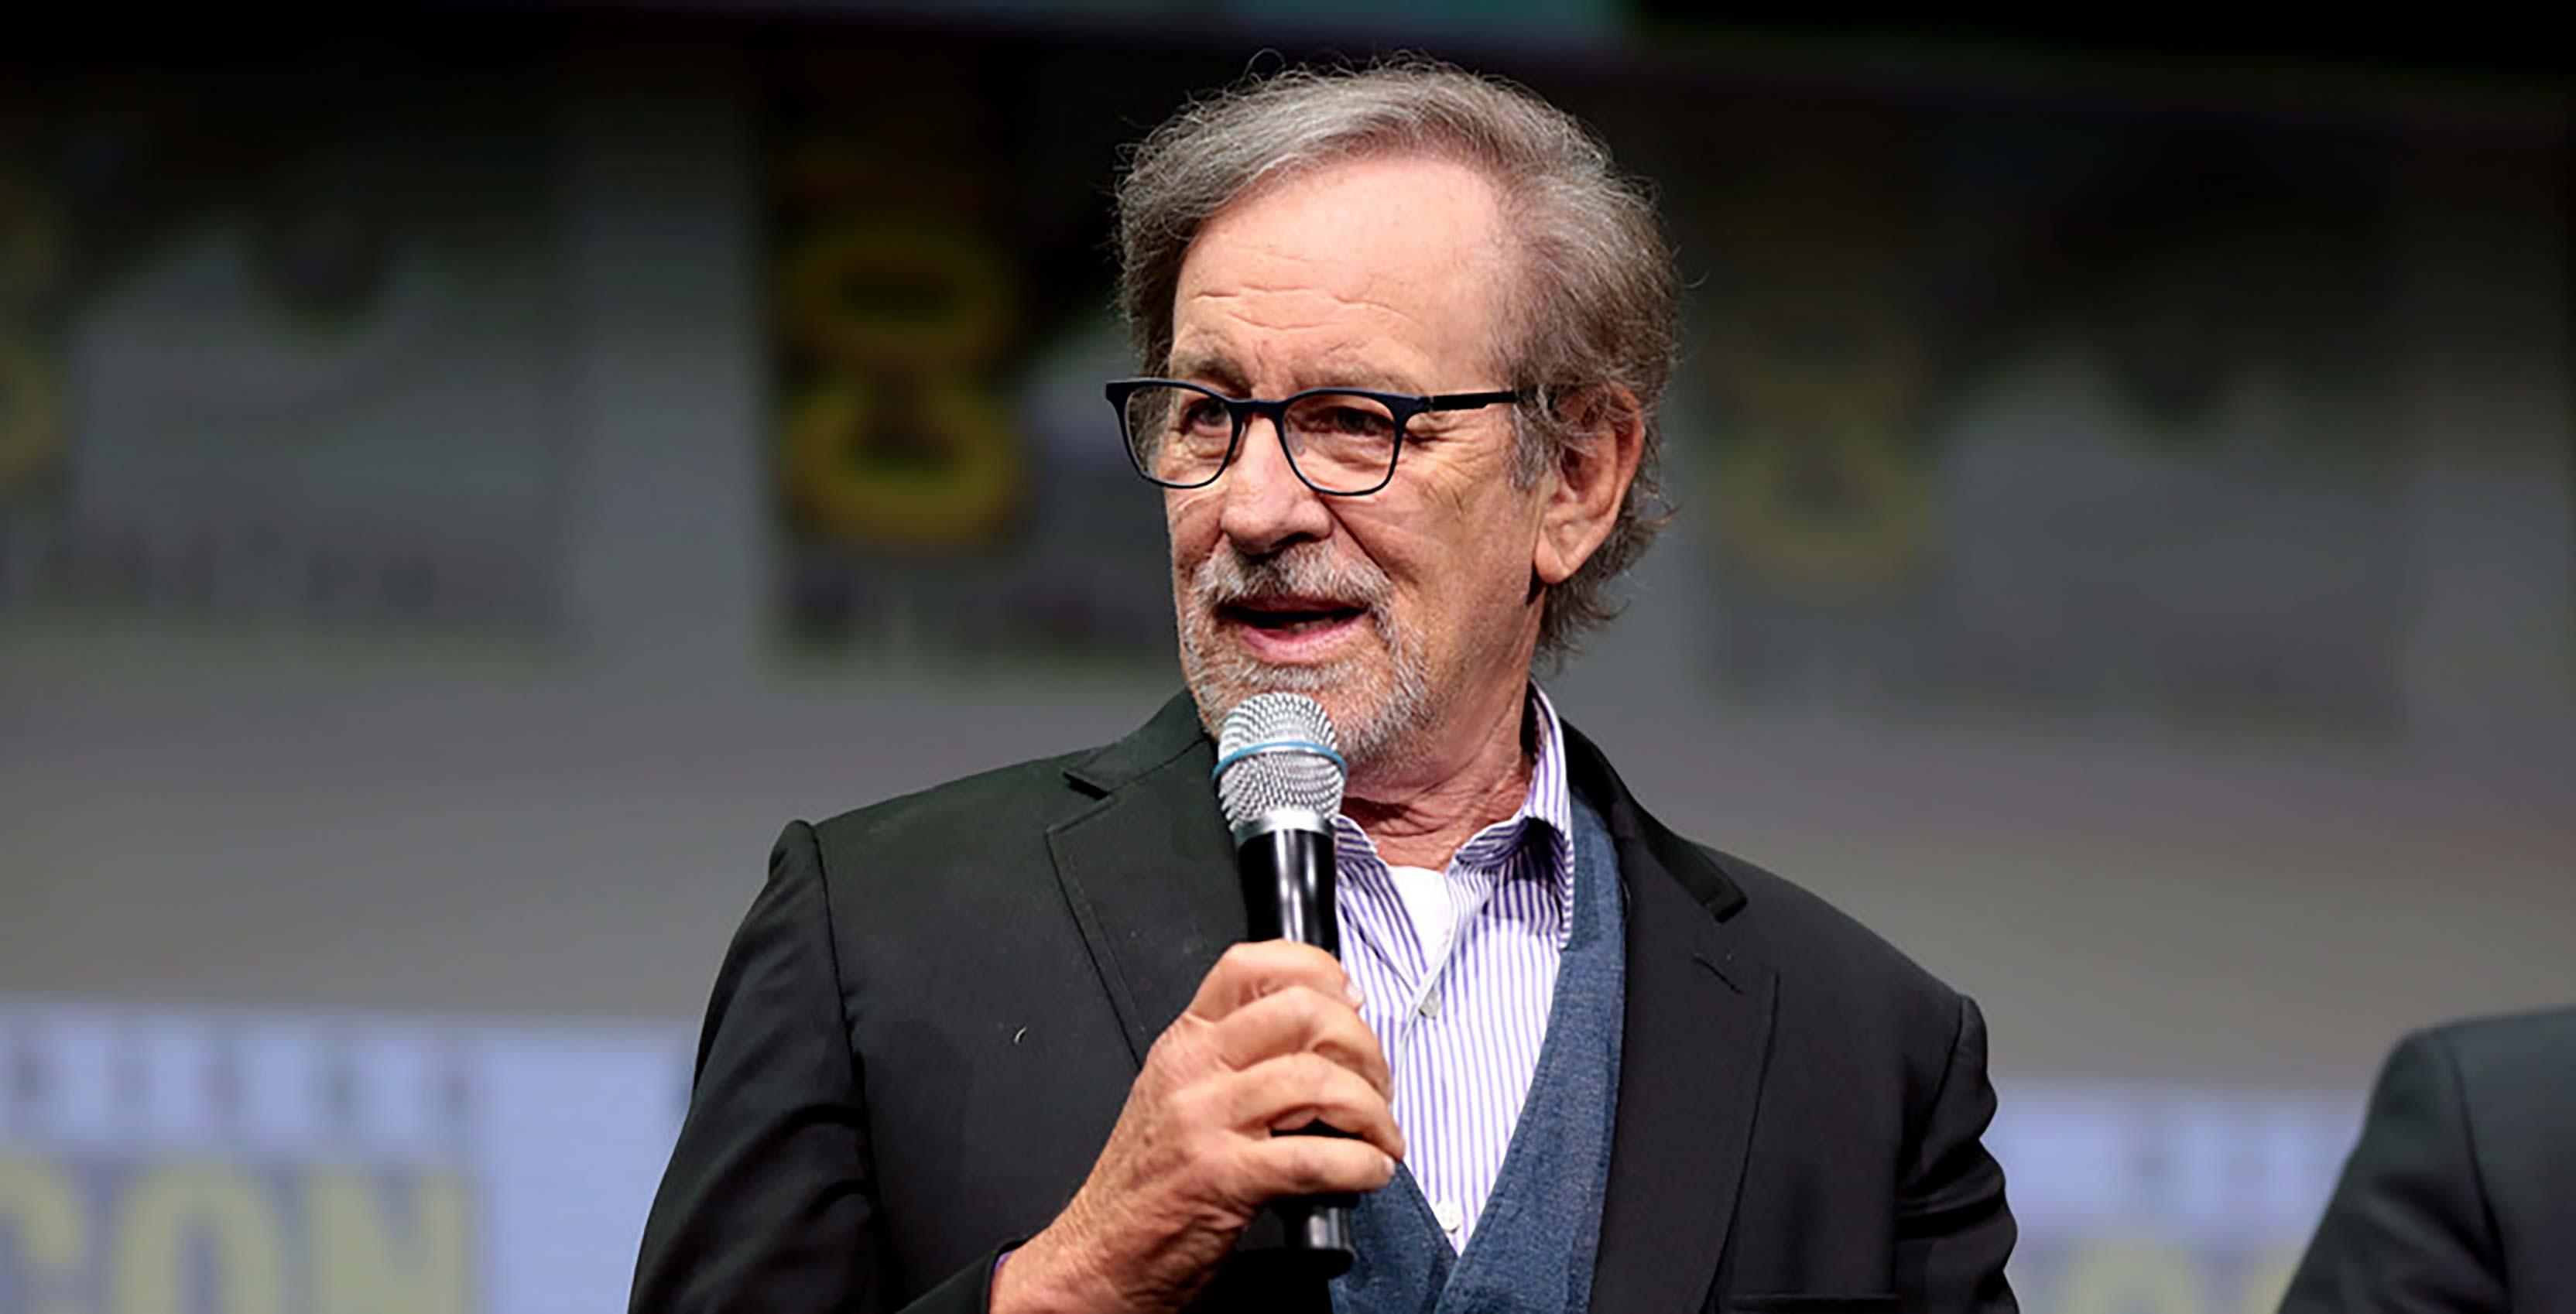 Steven Spielberg at San Diego Comic Con